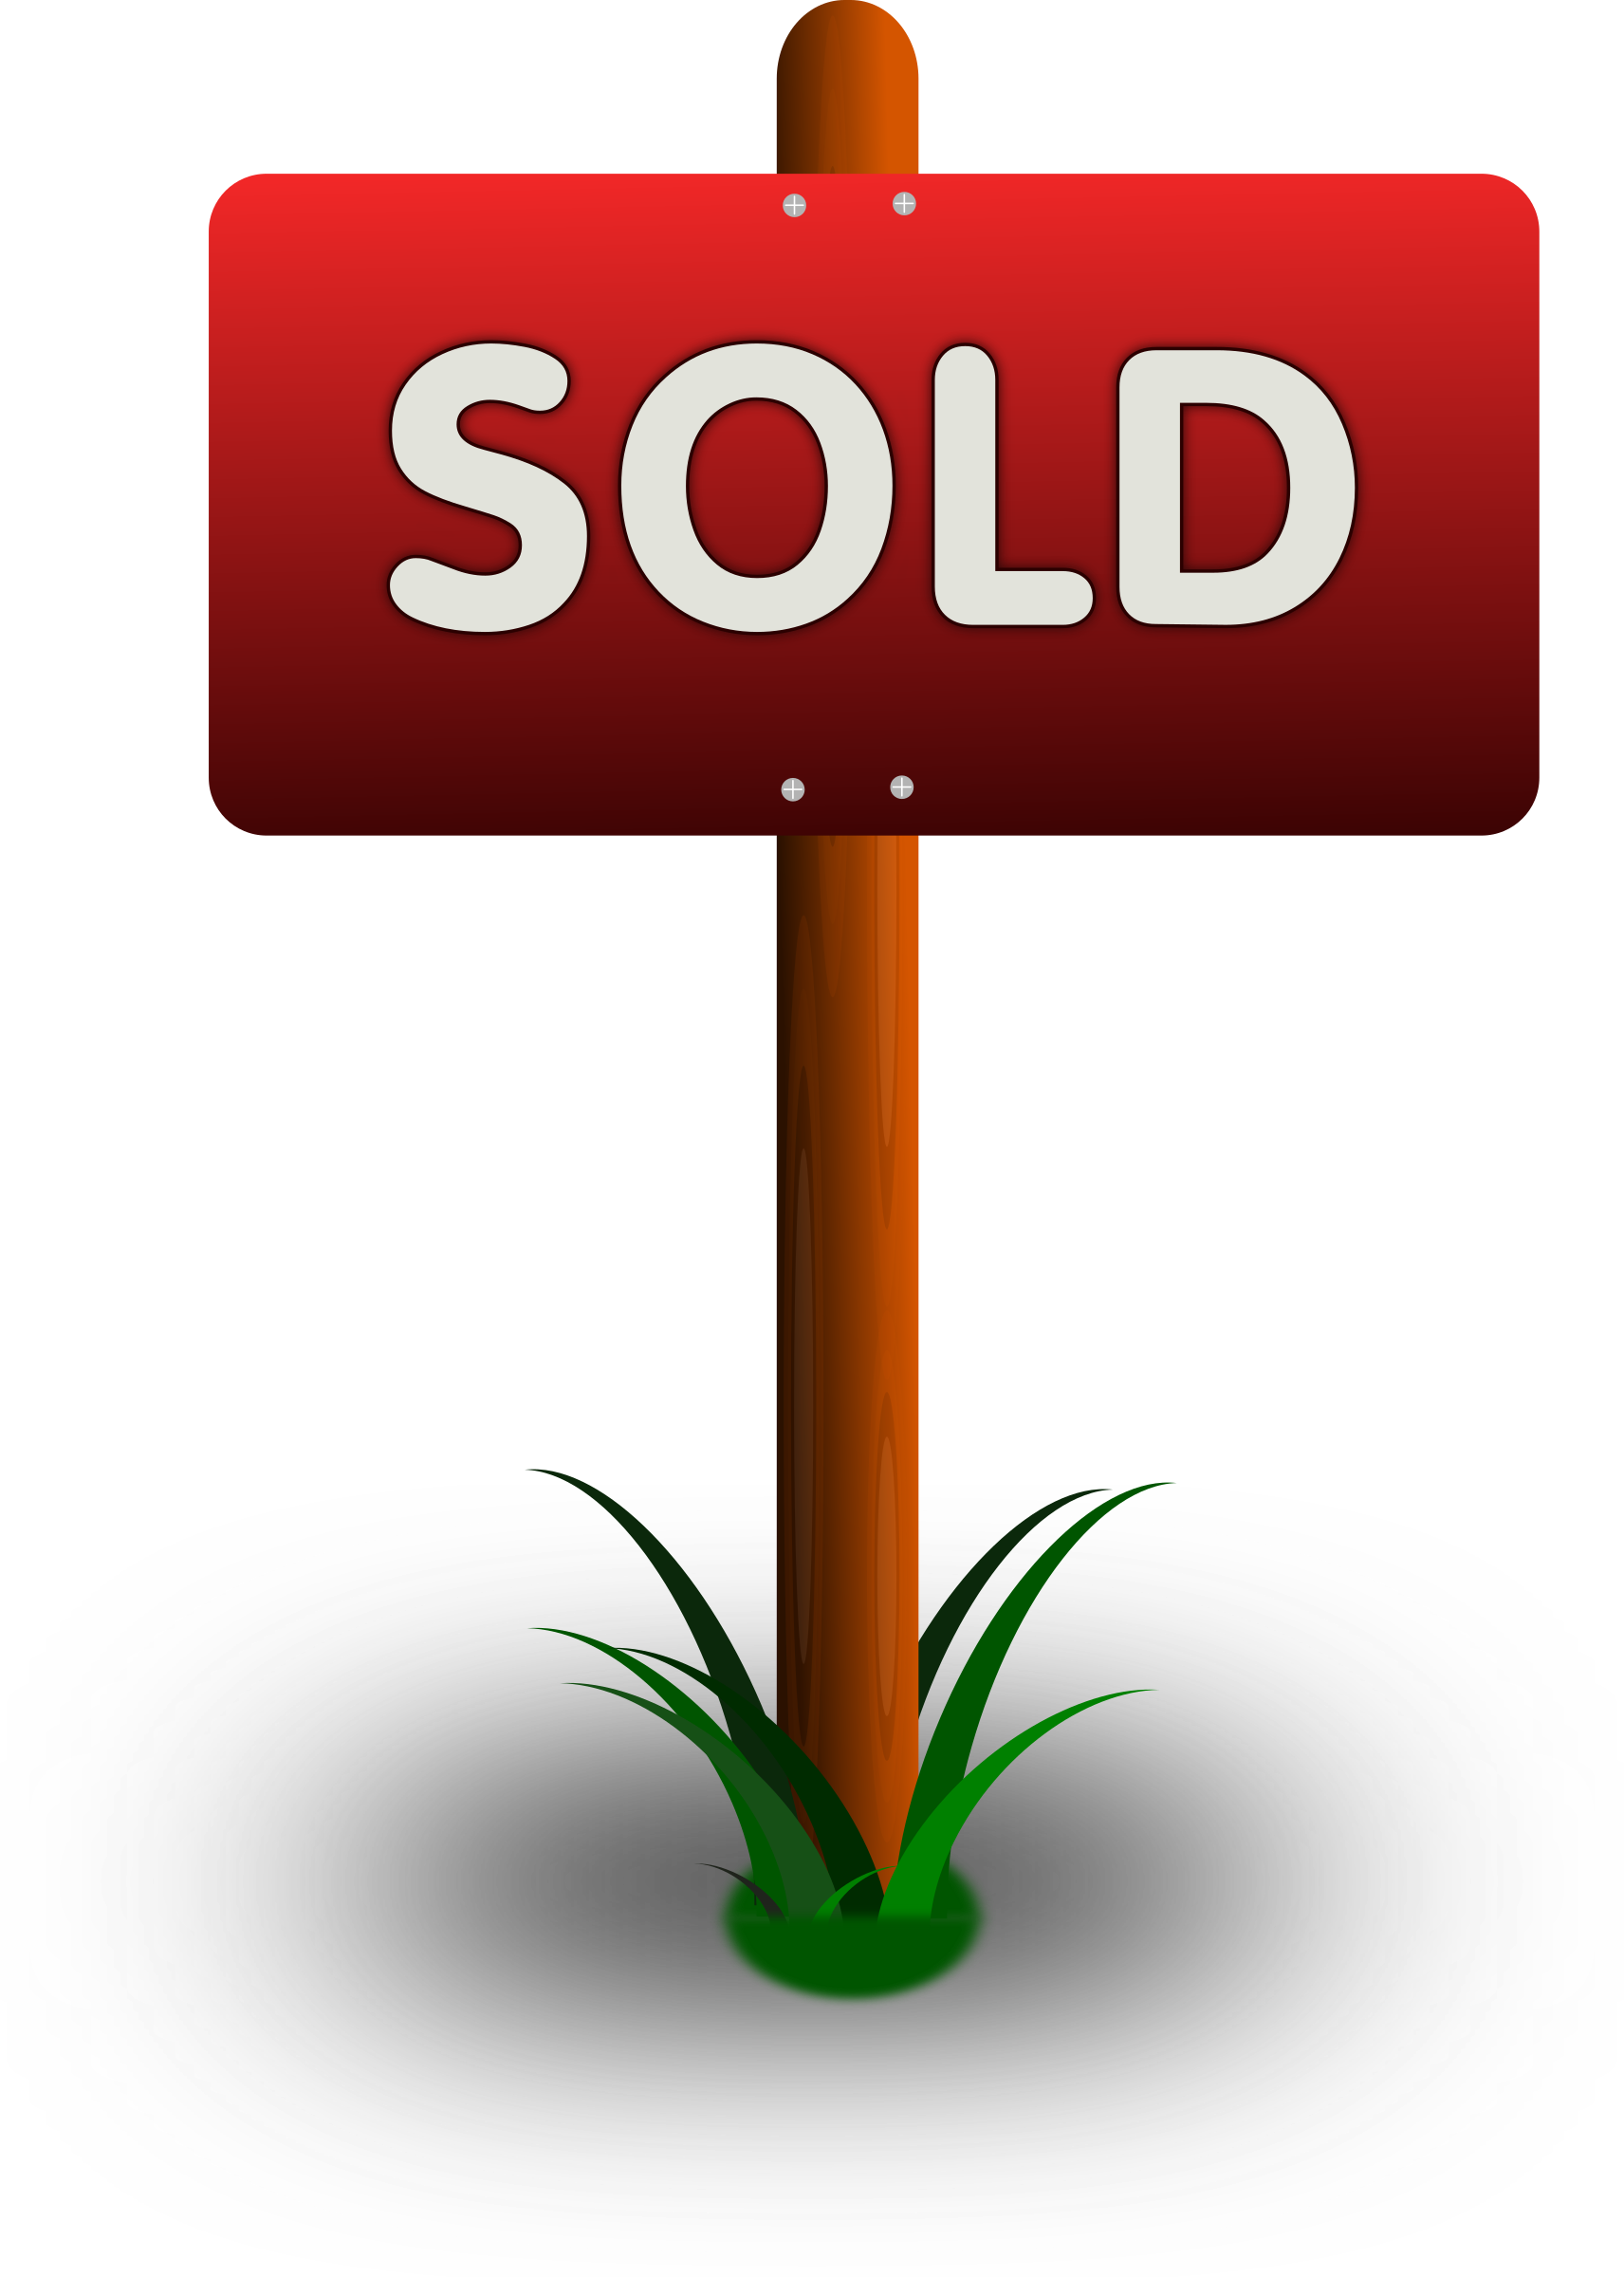 Sold big image png. Clipart banner sign